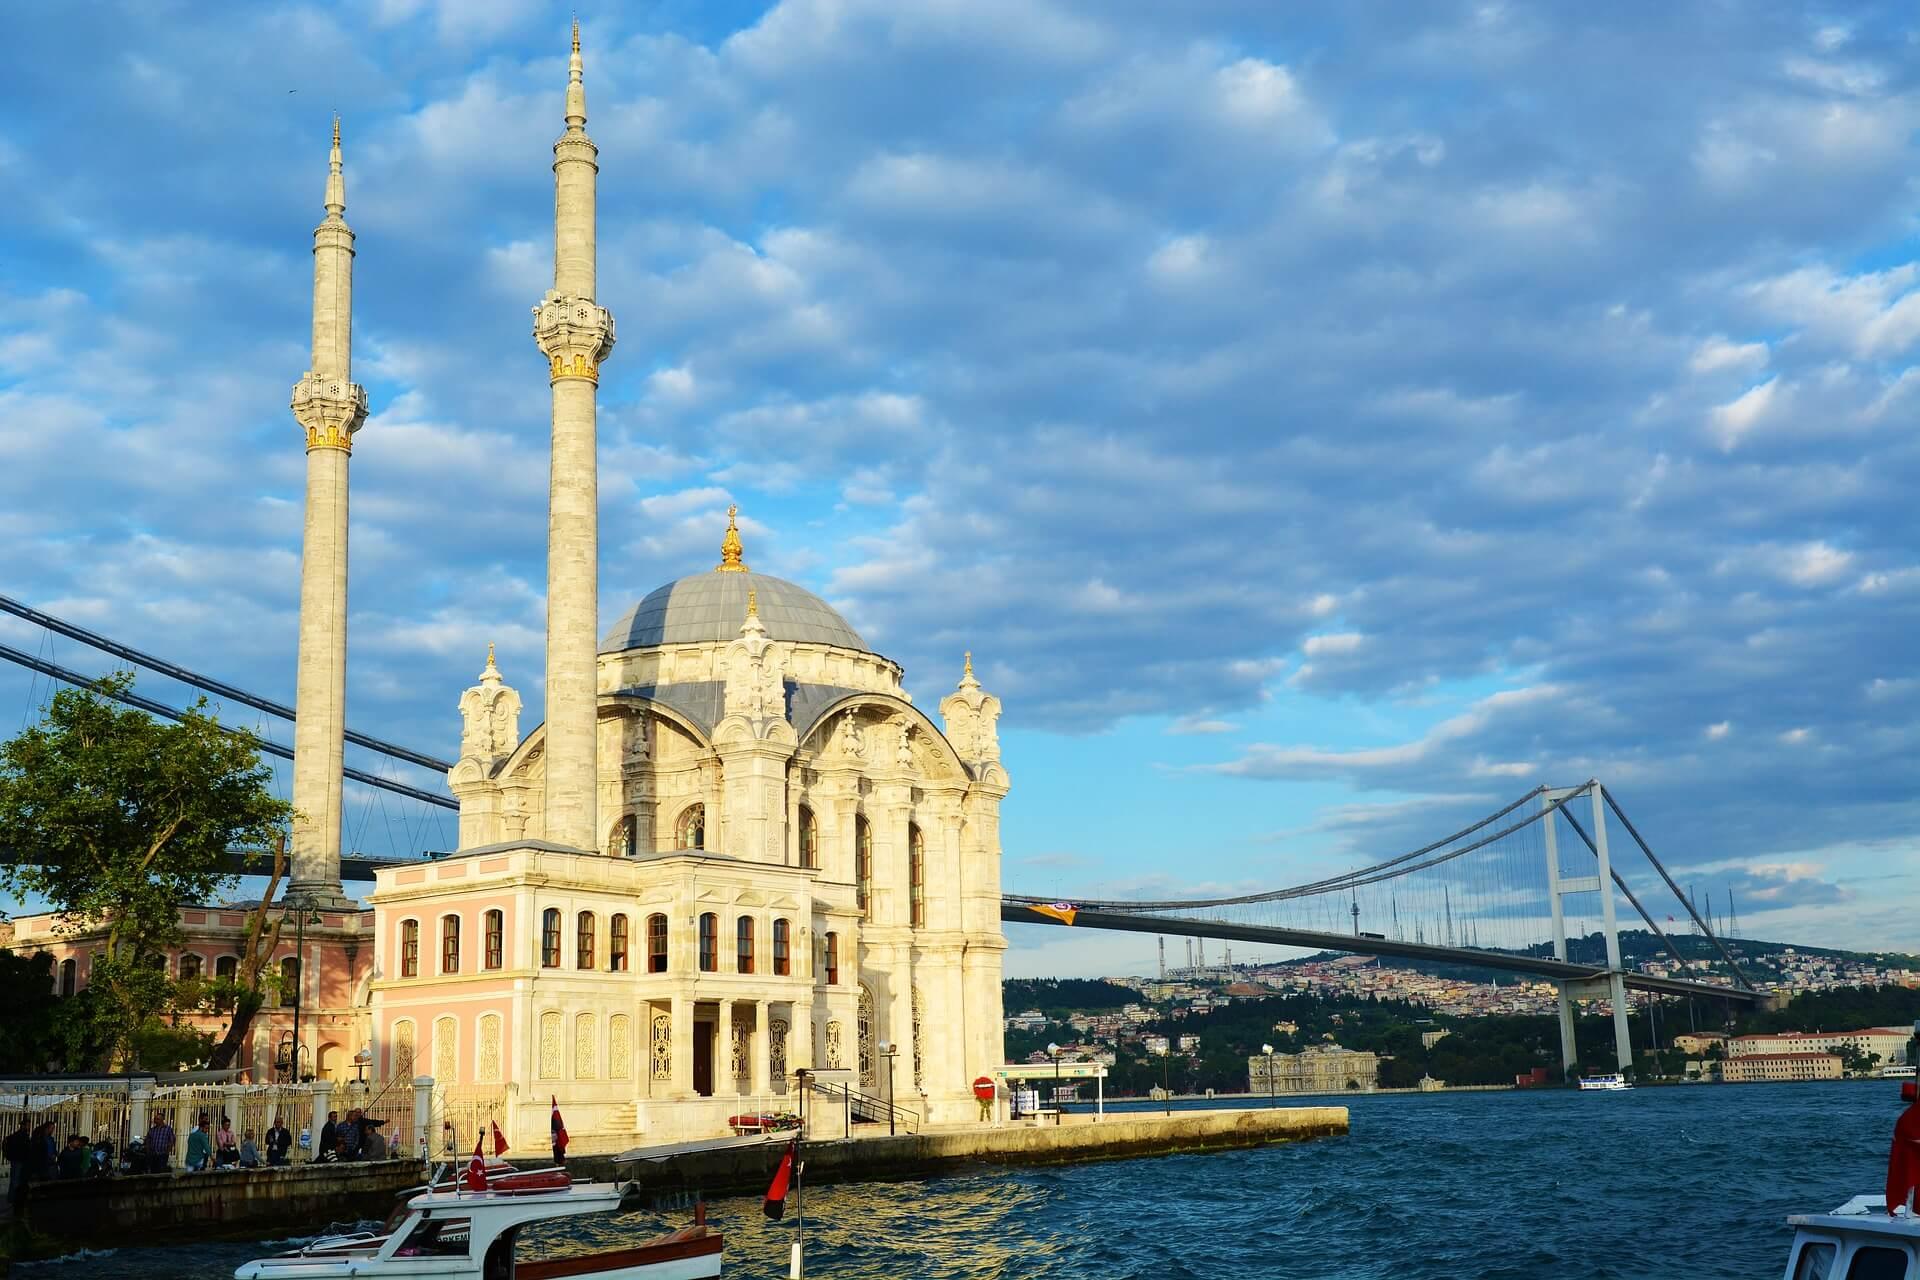 Direktflüge und Billigflüge ab Köln/Bonn nach Istanbul Atatürk